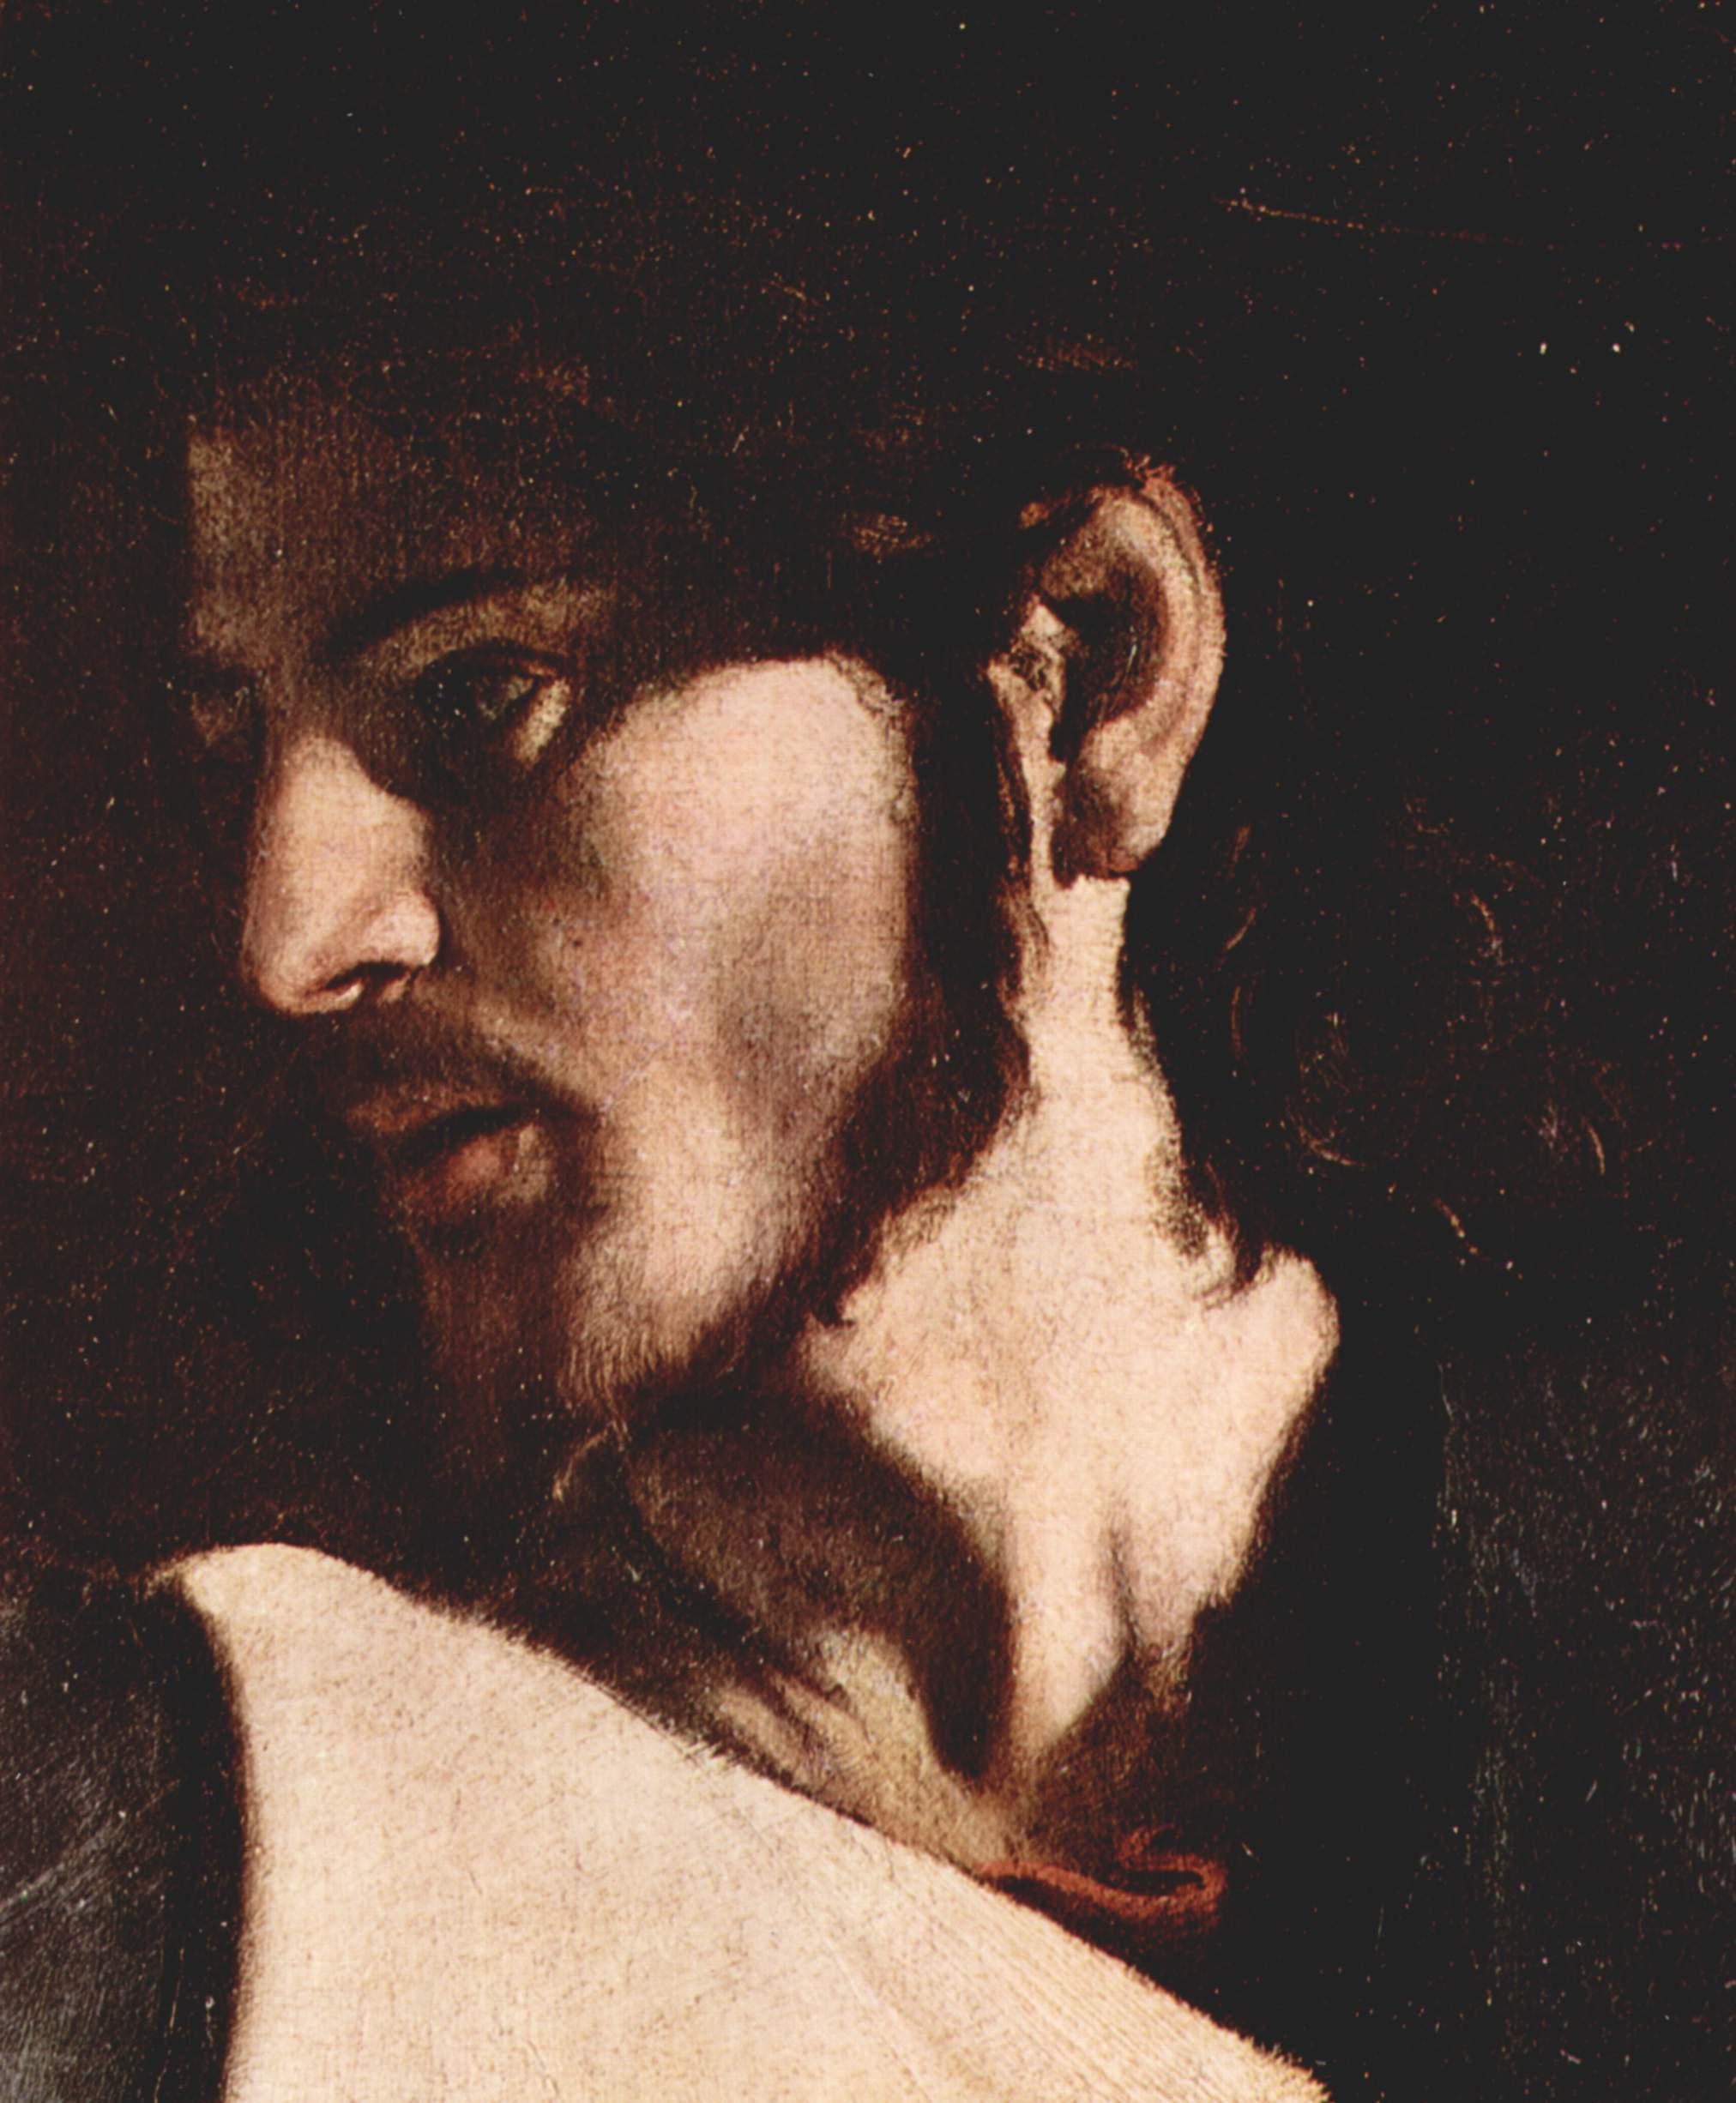 image michelangelo caravaggio - photo #6